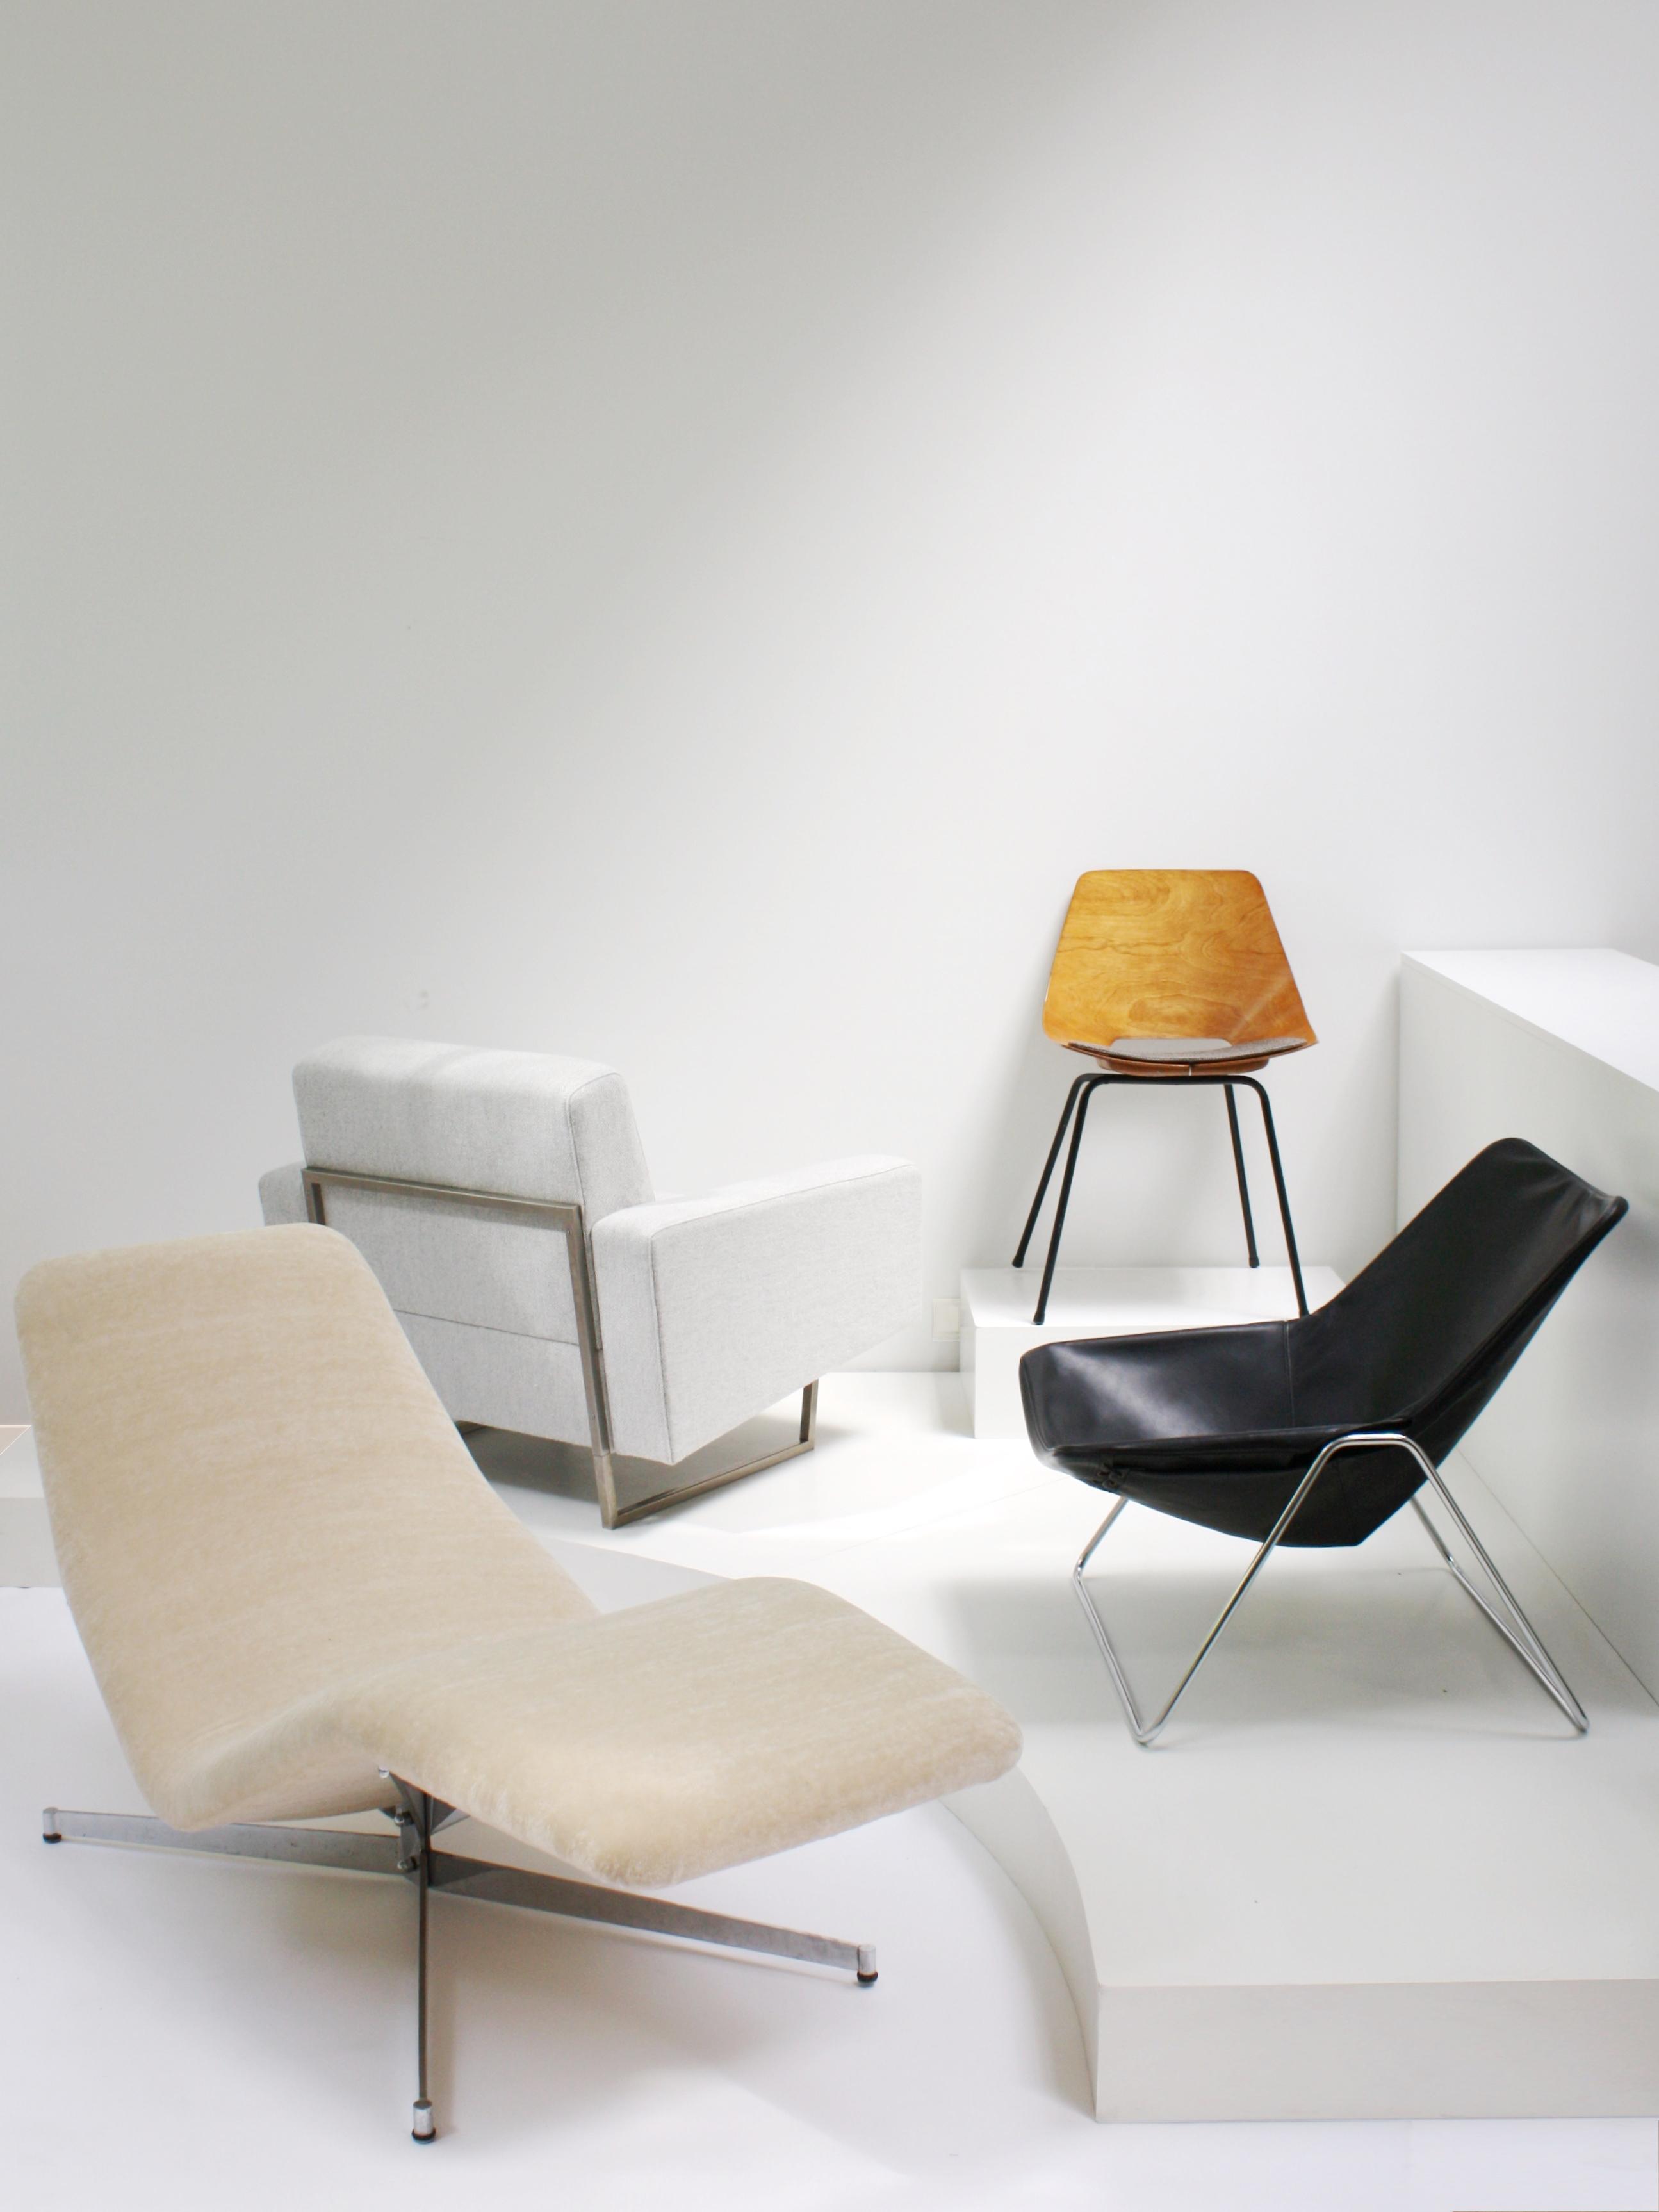 """STONE Seats GUARICHE the Introuvables"" © Galerie Alexandre Guillemain"